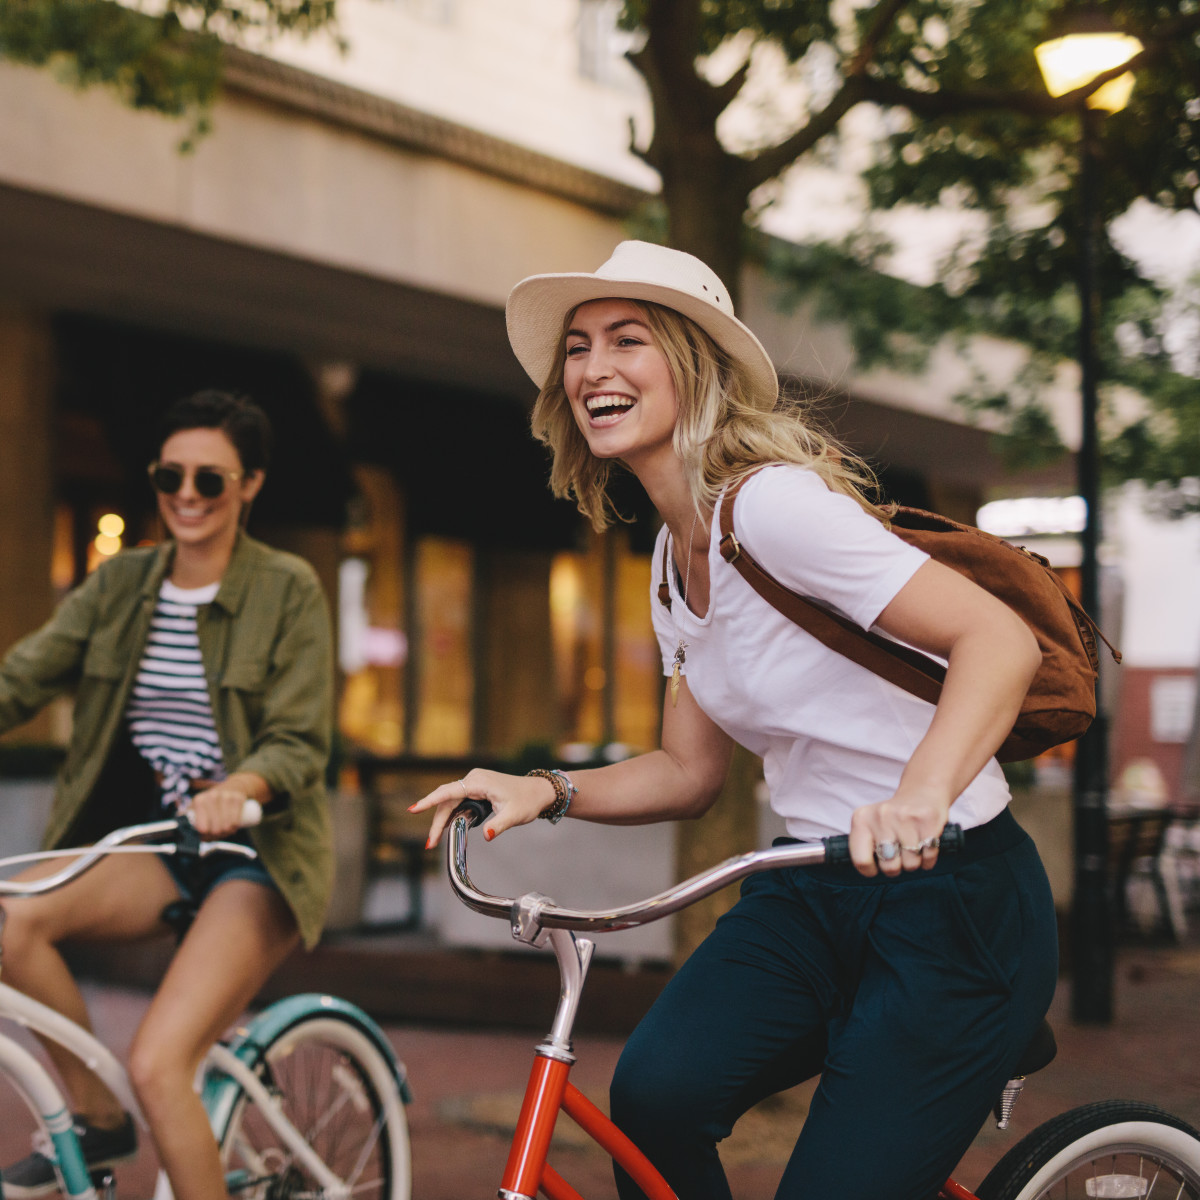 Two girls riding bikes